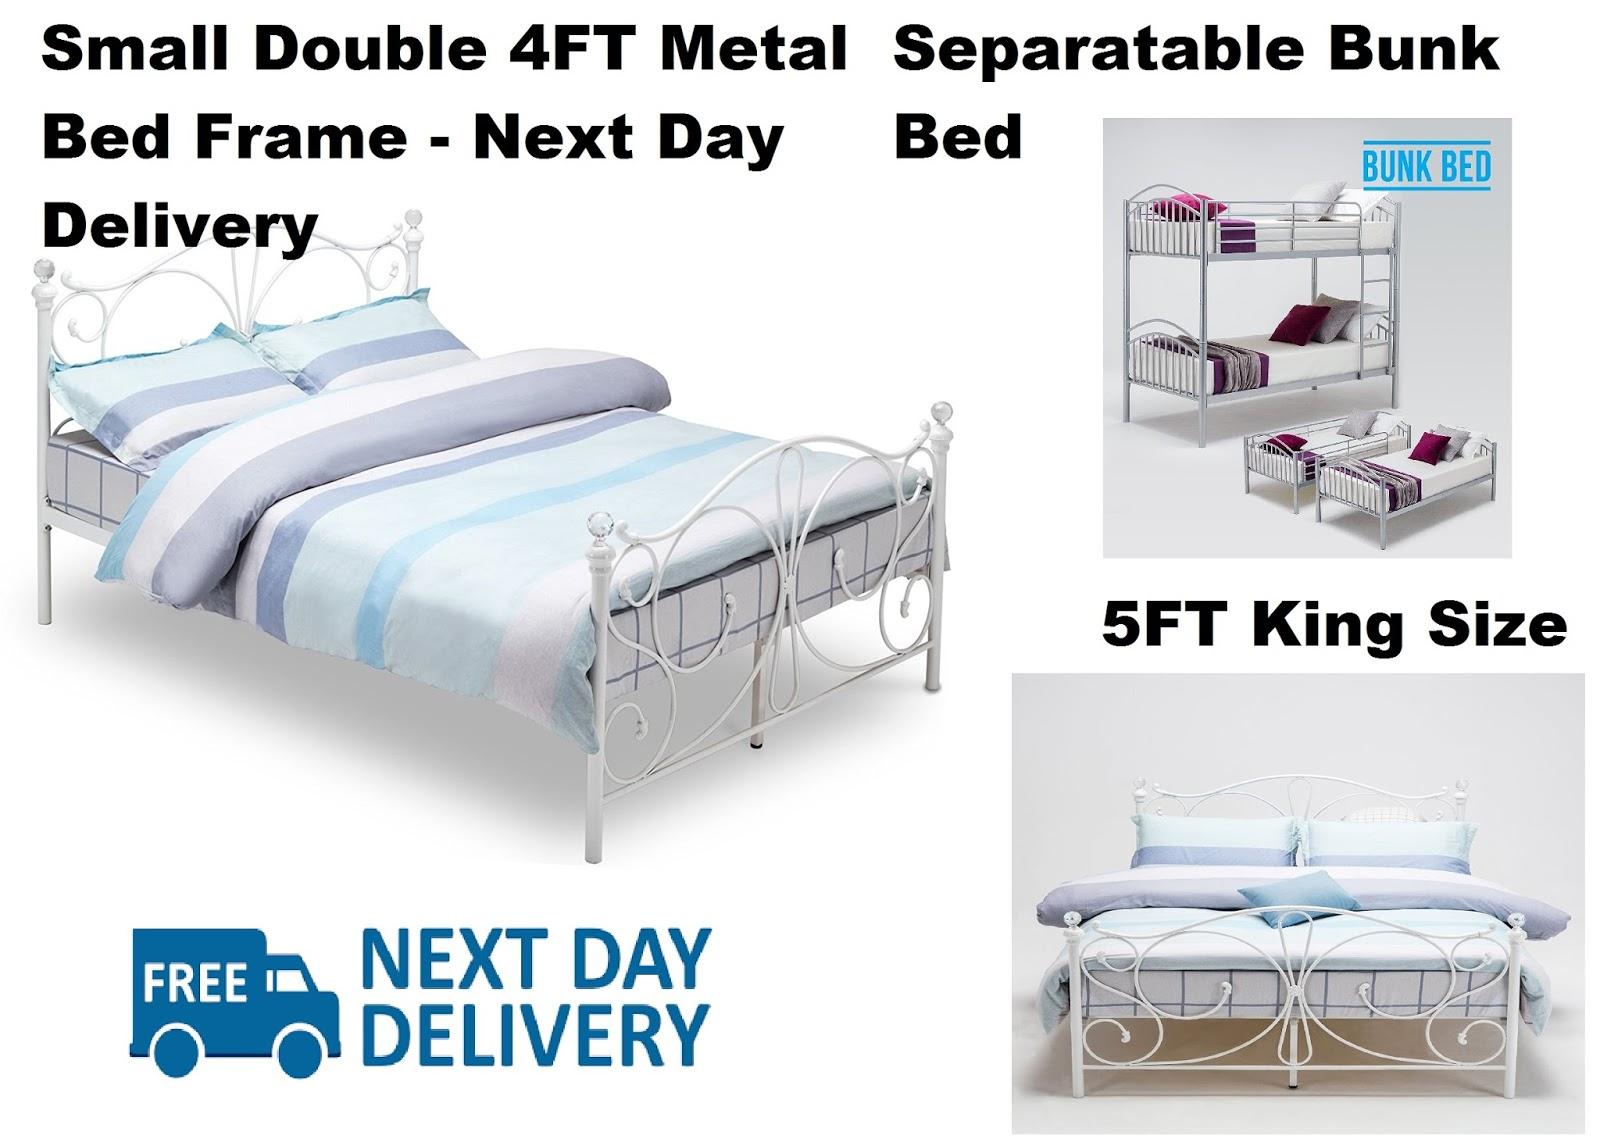 metal bed frame 4ft small double separable 3ft bunk 4ft6. Black Bedroom Furniture Sets. Home Design Ideas